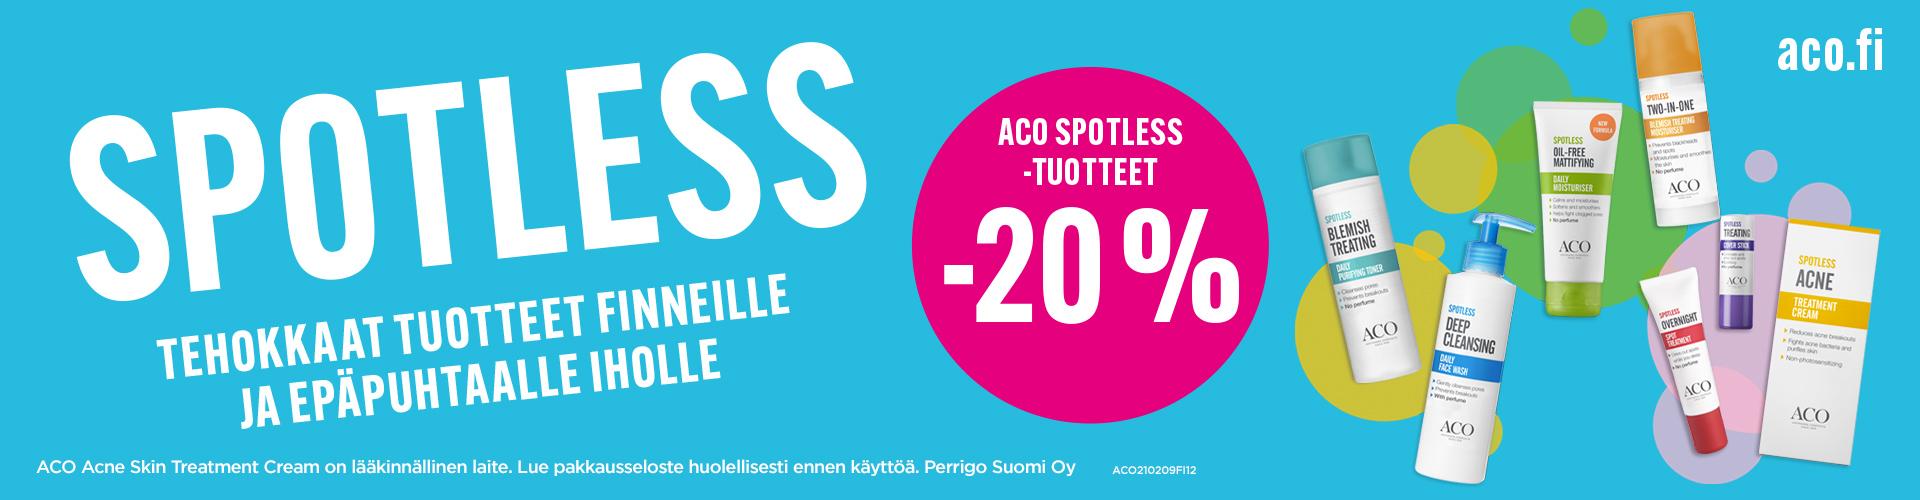 ACO Spotless -20 %